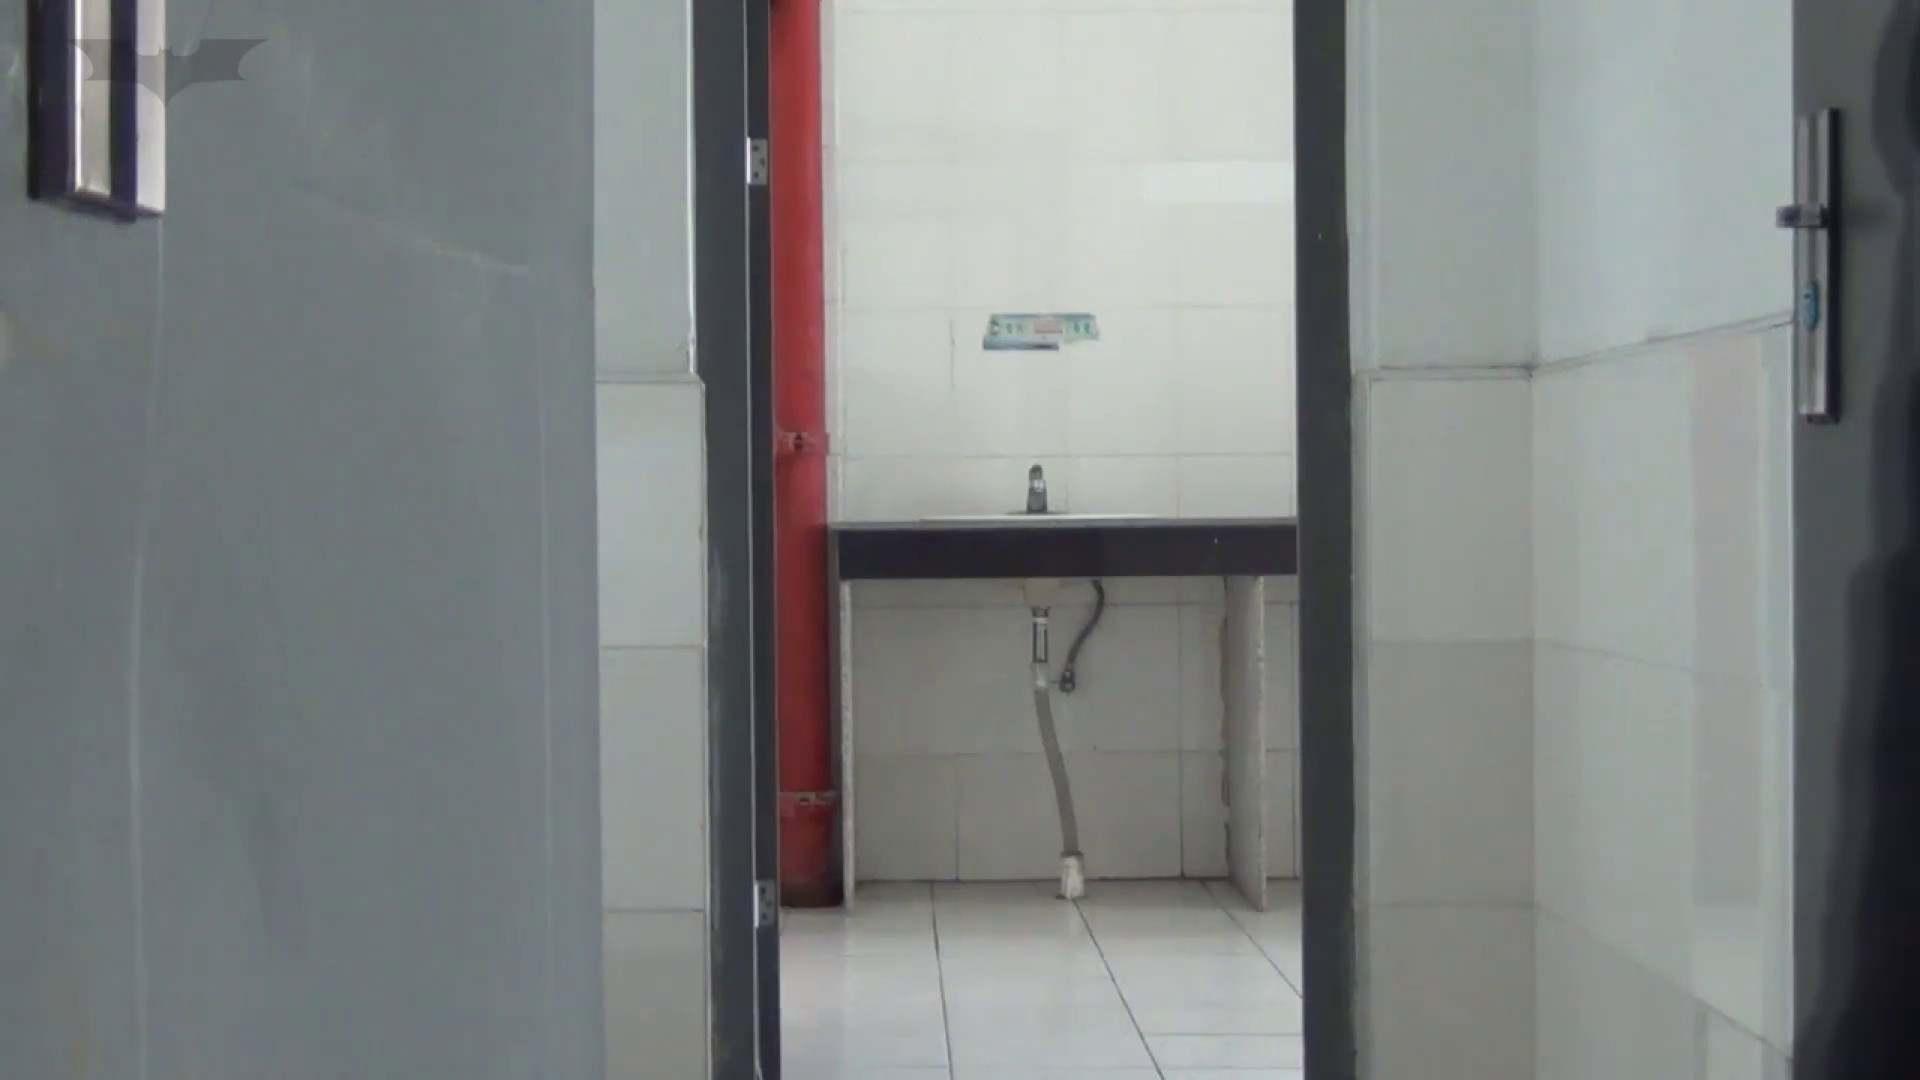 JD盗撮 美女の洗面所の秘密 Vol.33 盗撮で悶絶 エロ画像 68画像 42